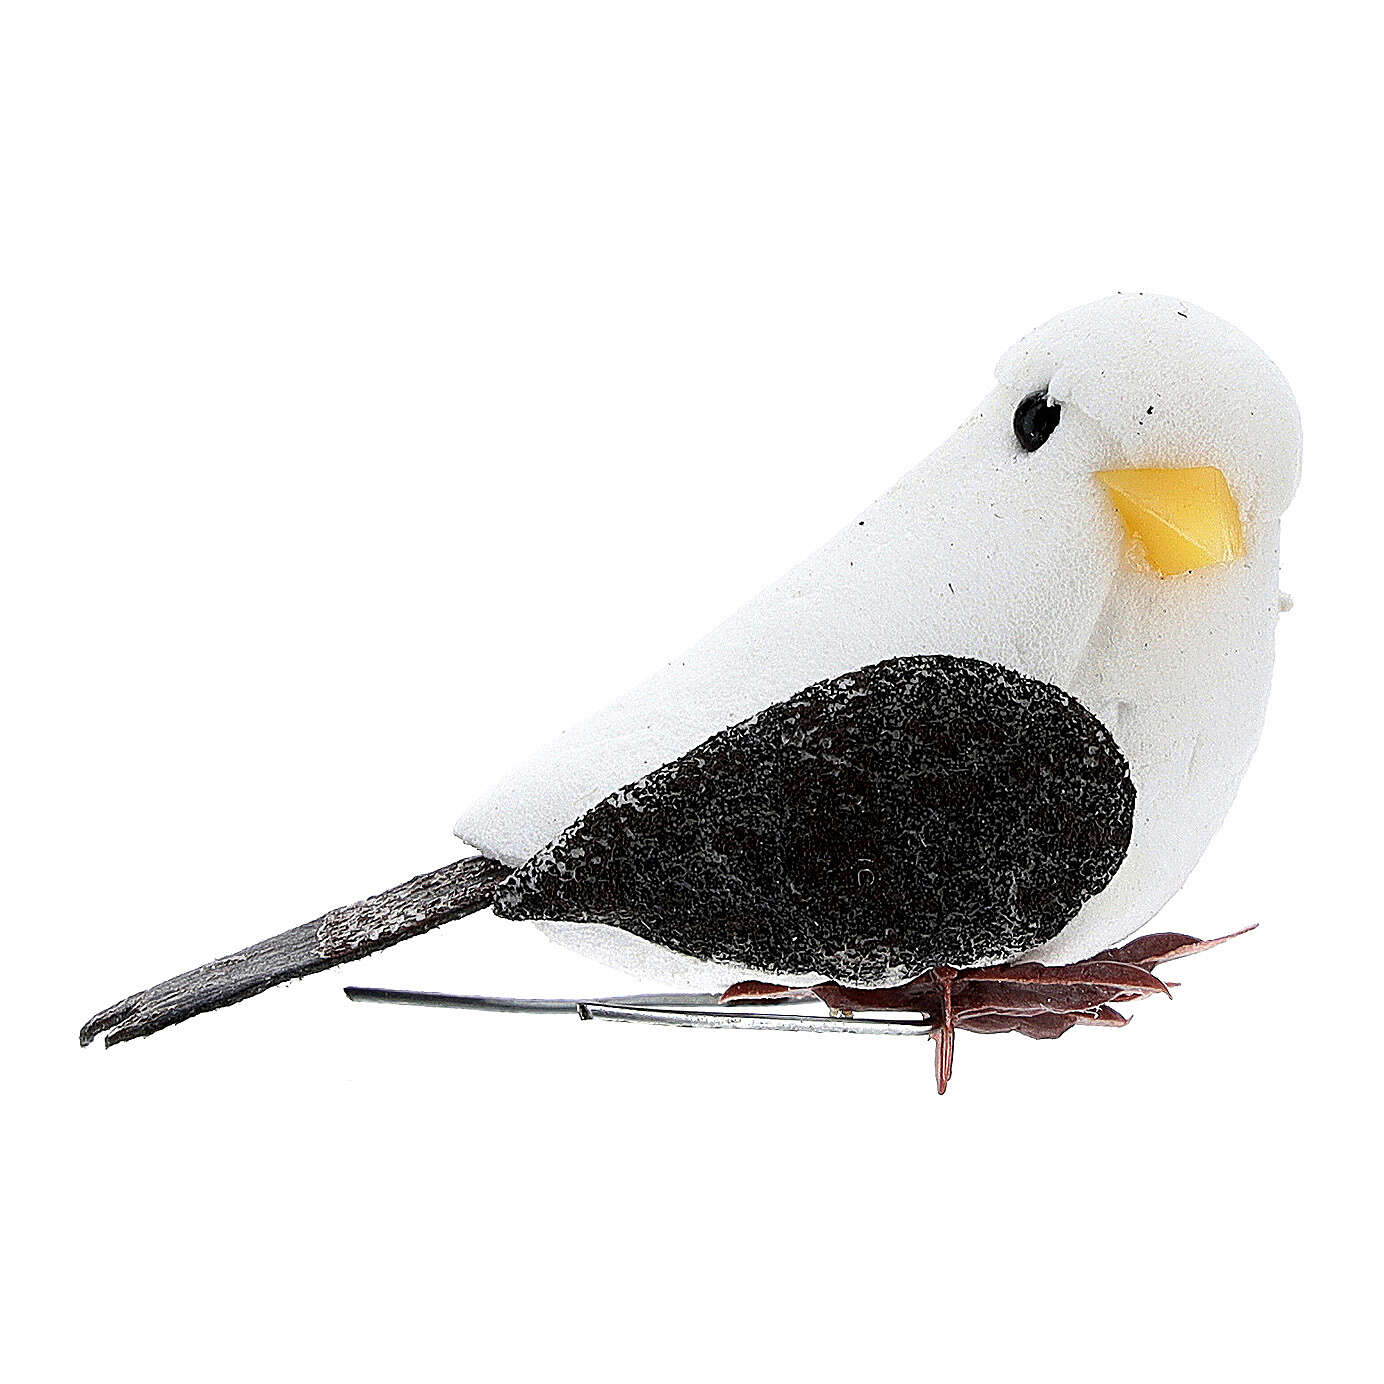 Pigeon bricolage crèche 8 cm 3